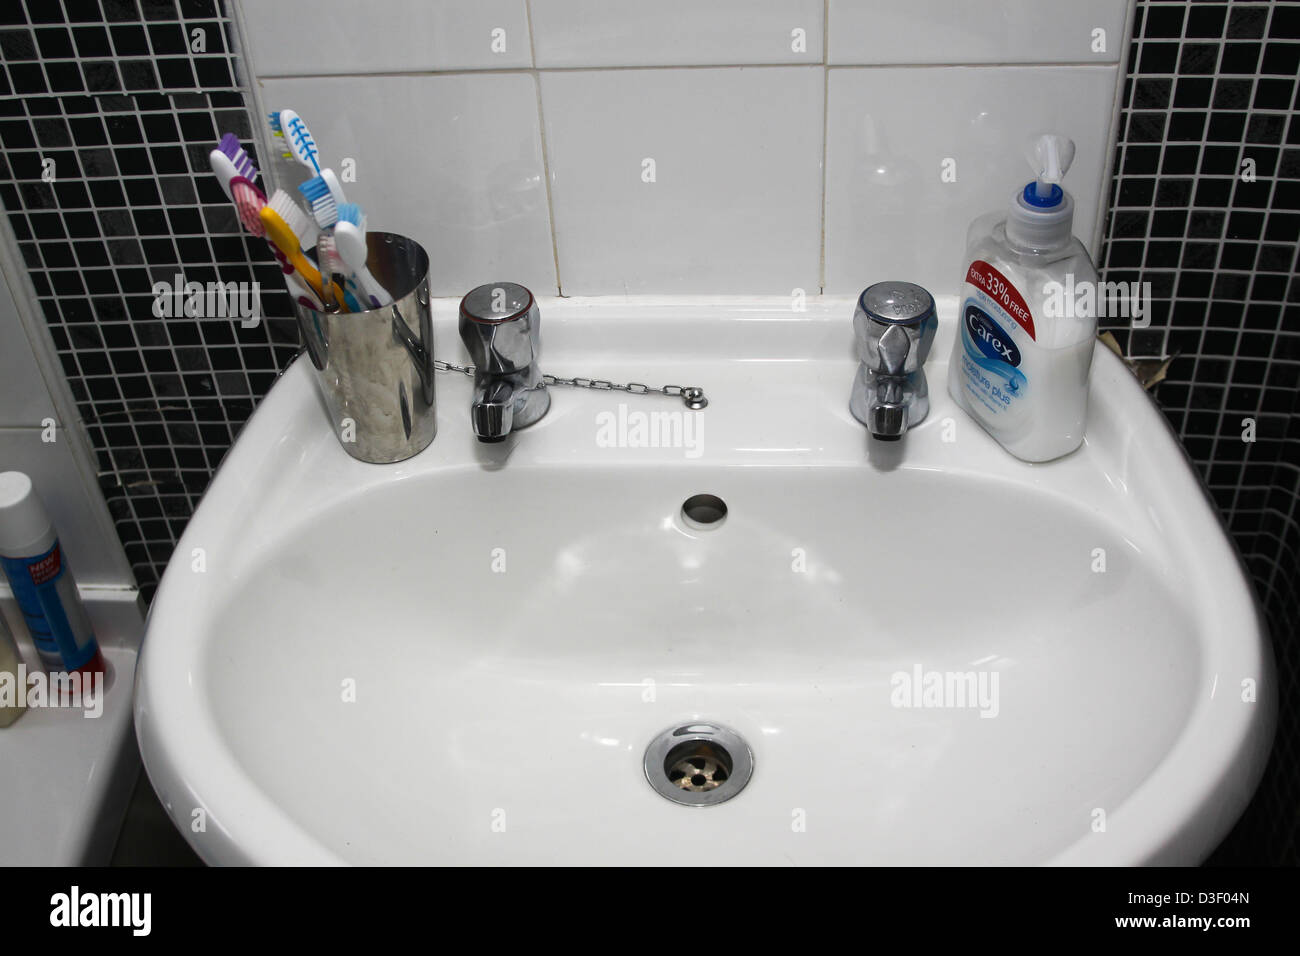 https www alamy com stock photo domestic wash hand basin in toilet 53804485 html